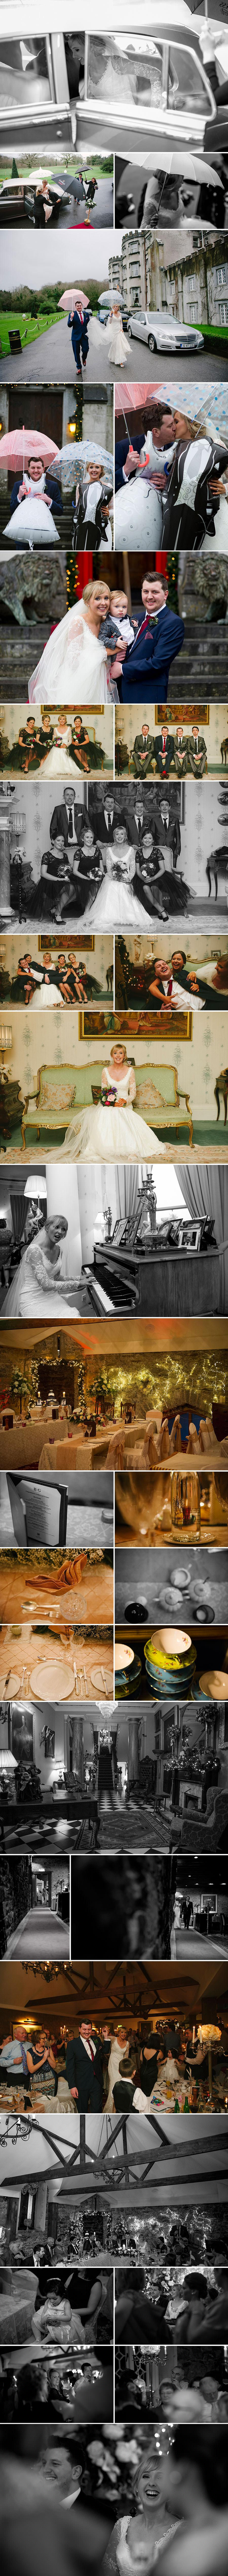 Ballyseede Castle Wedding (7)